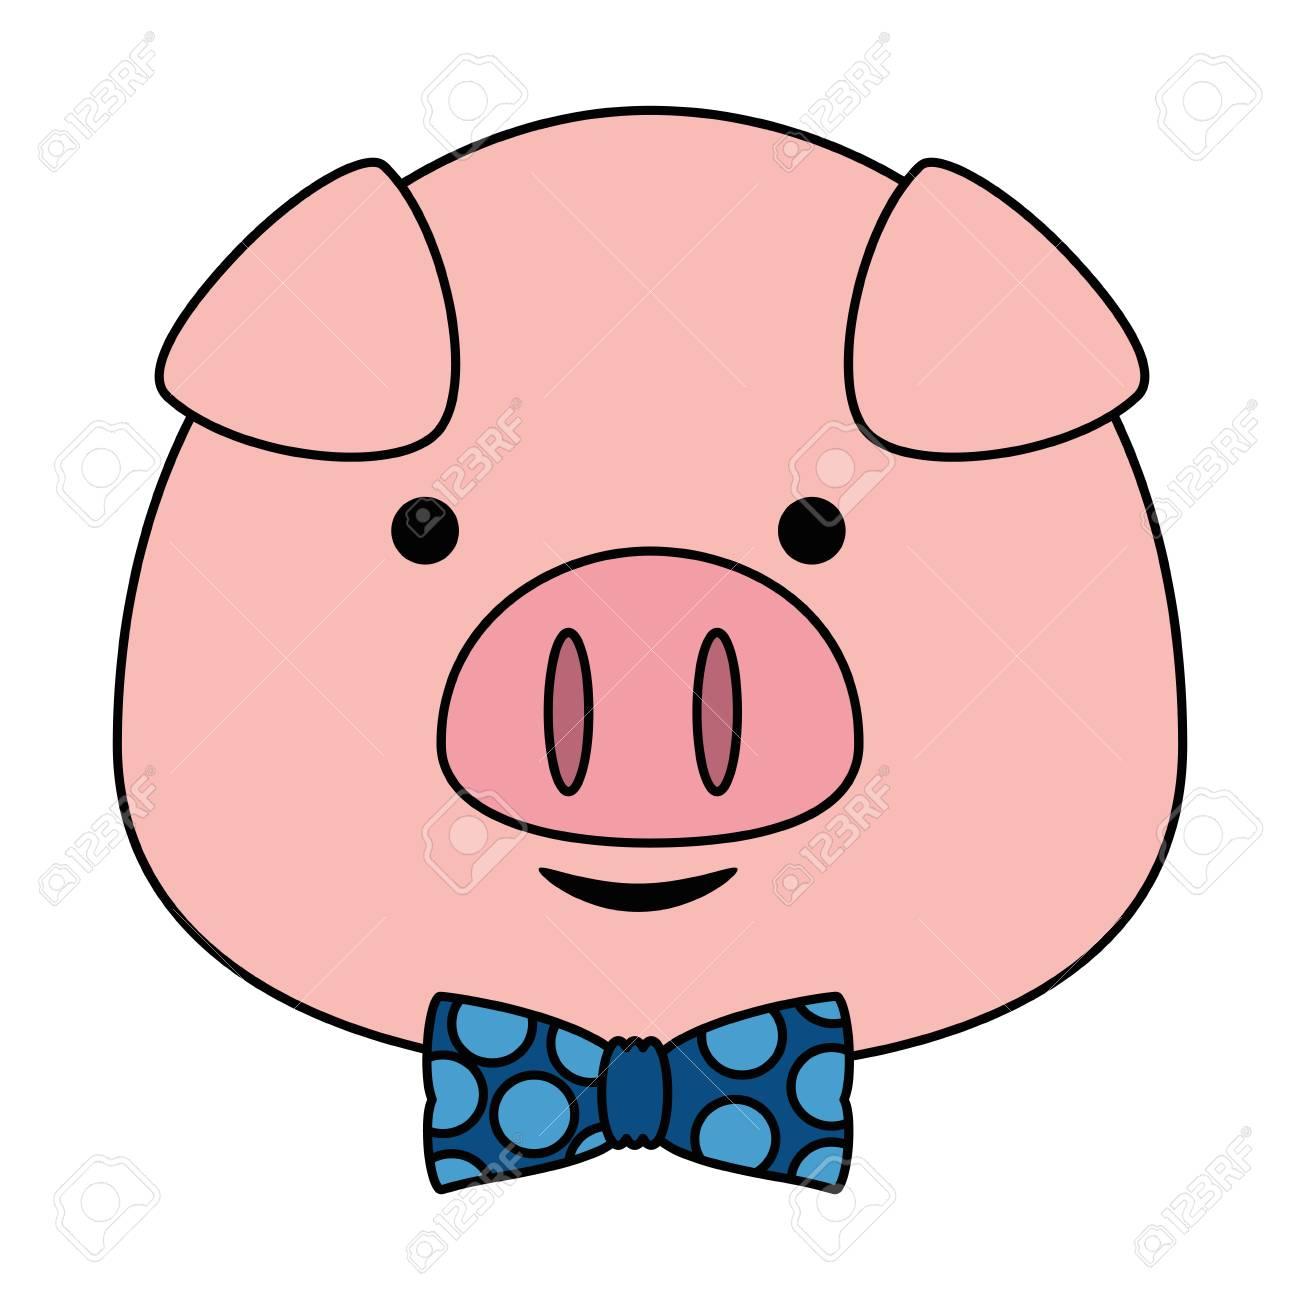 cute little pig head adorable character vector illustration design.